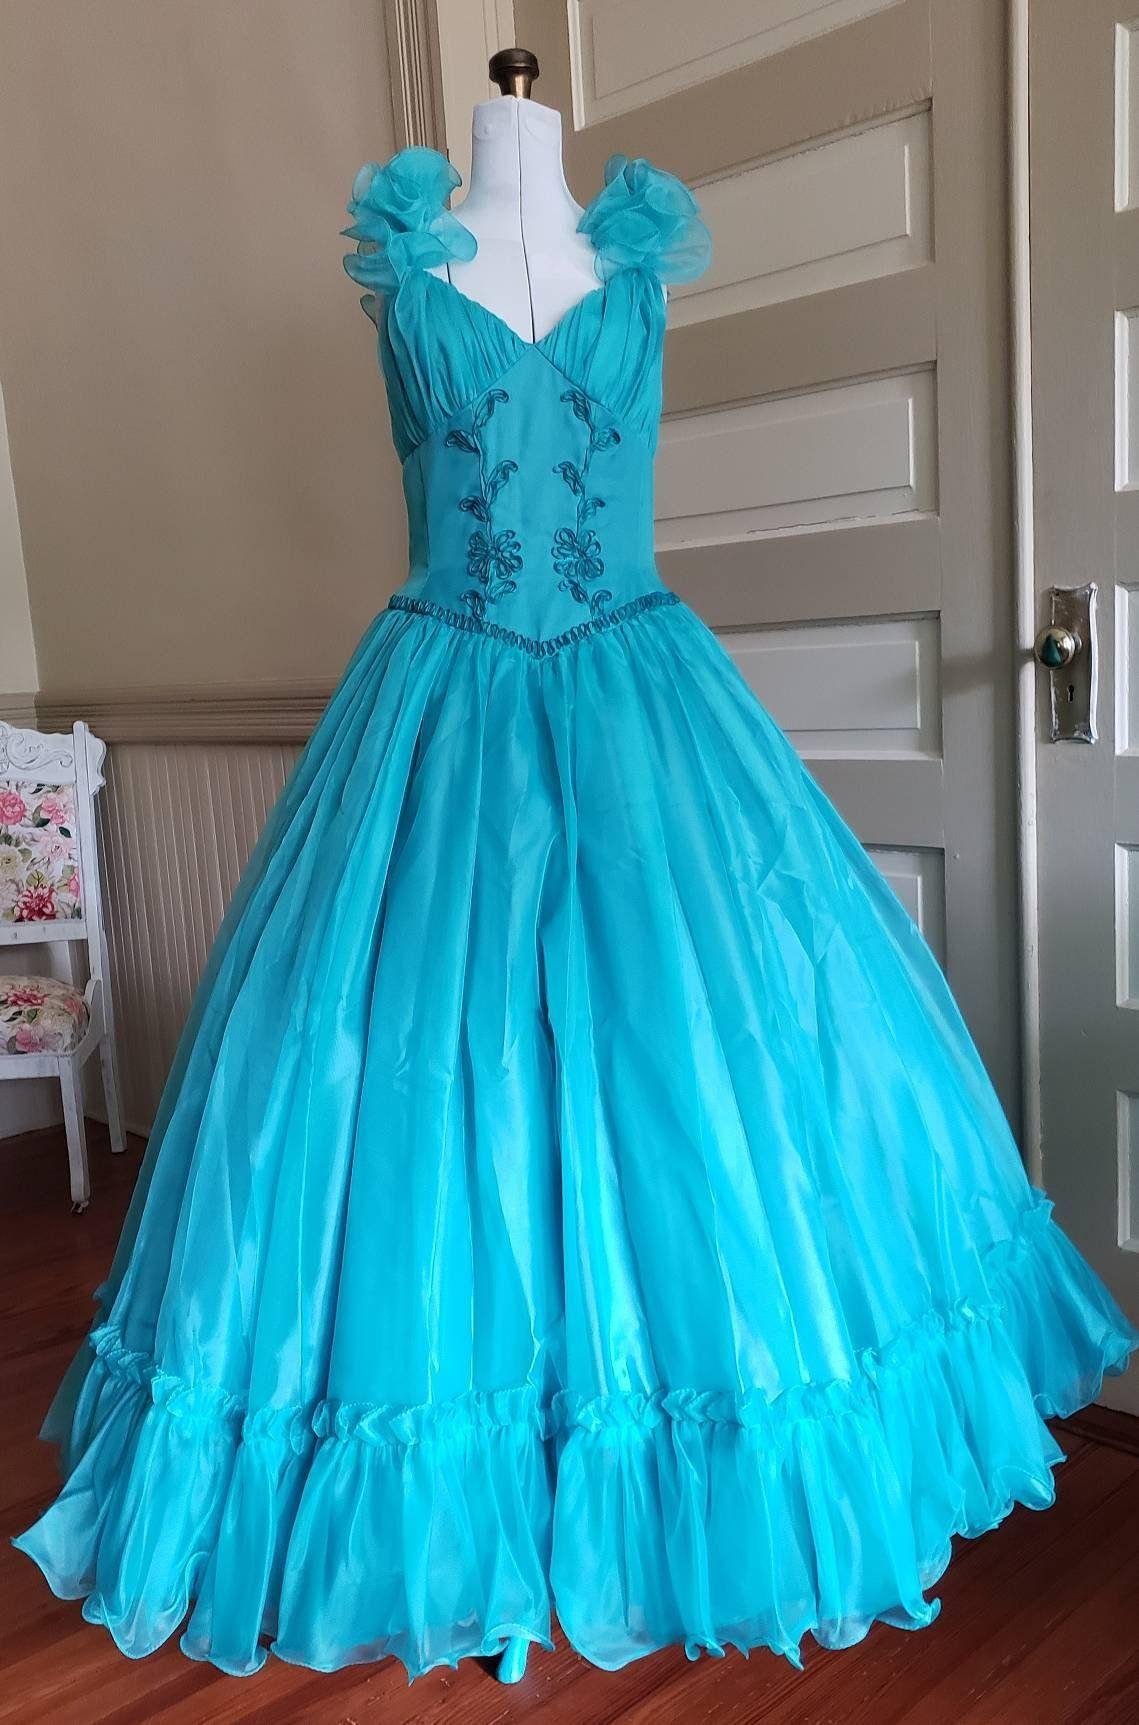 80s Prom Dress Vintage Aqua Ball Gown Mike Benet Formals Etsy Prom Dresses Vintage Ball Gowns 80s Prom Dress [ 1725 x 1139 Pixel ]